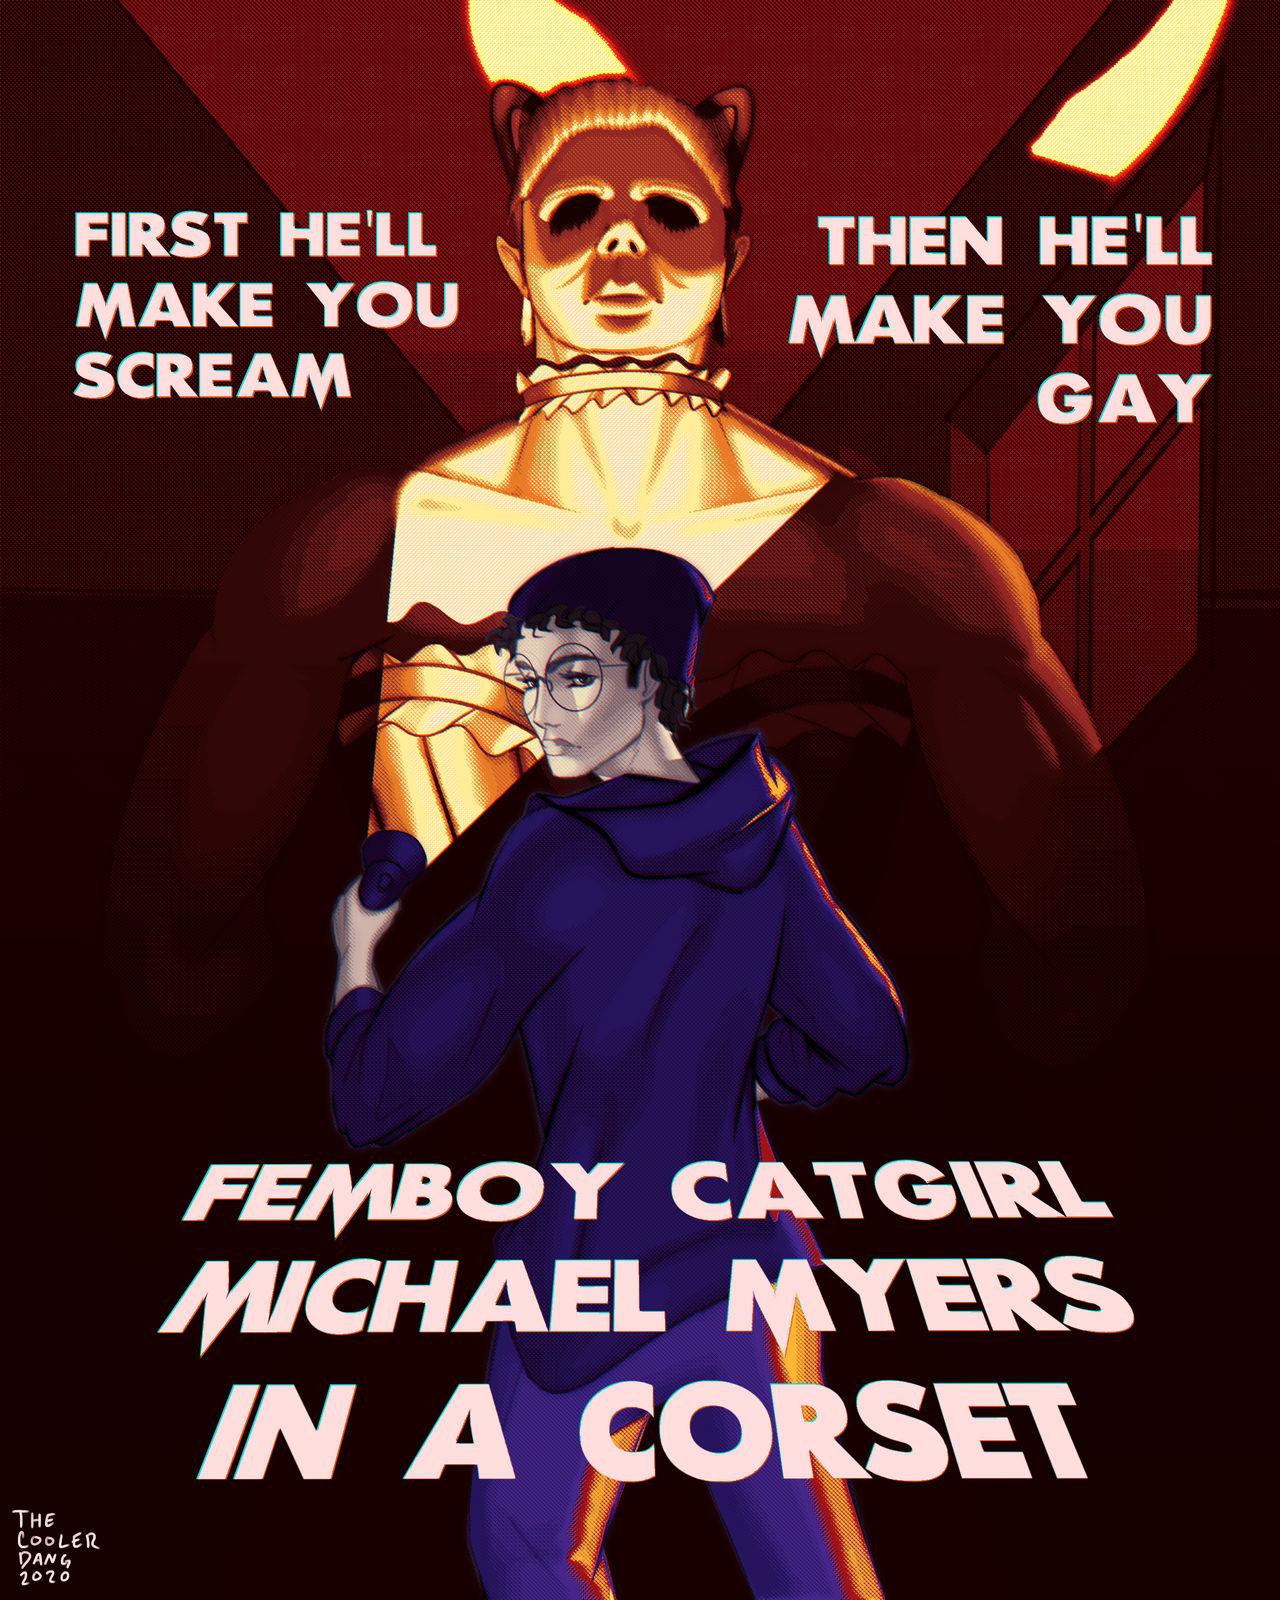 Catgirl Michael Myers